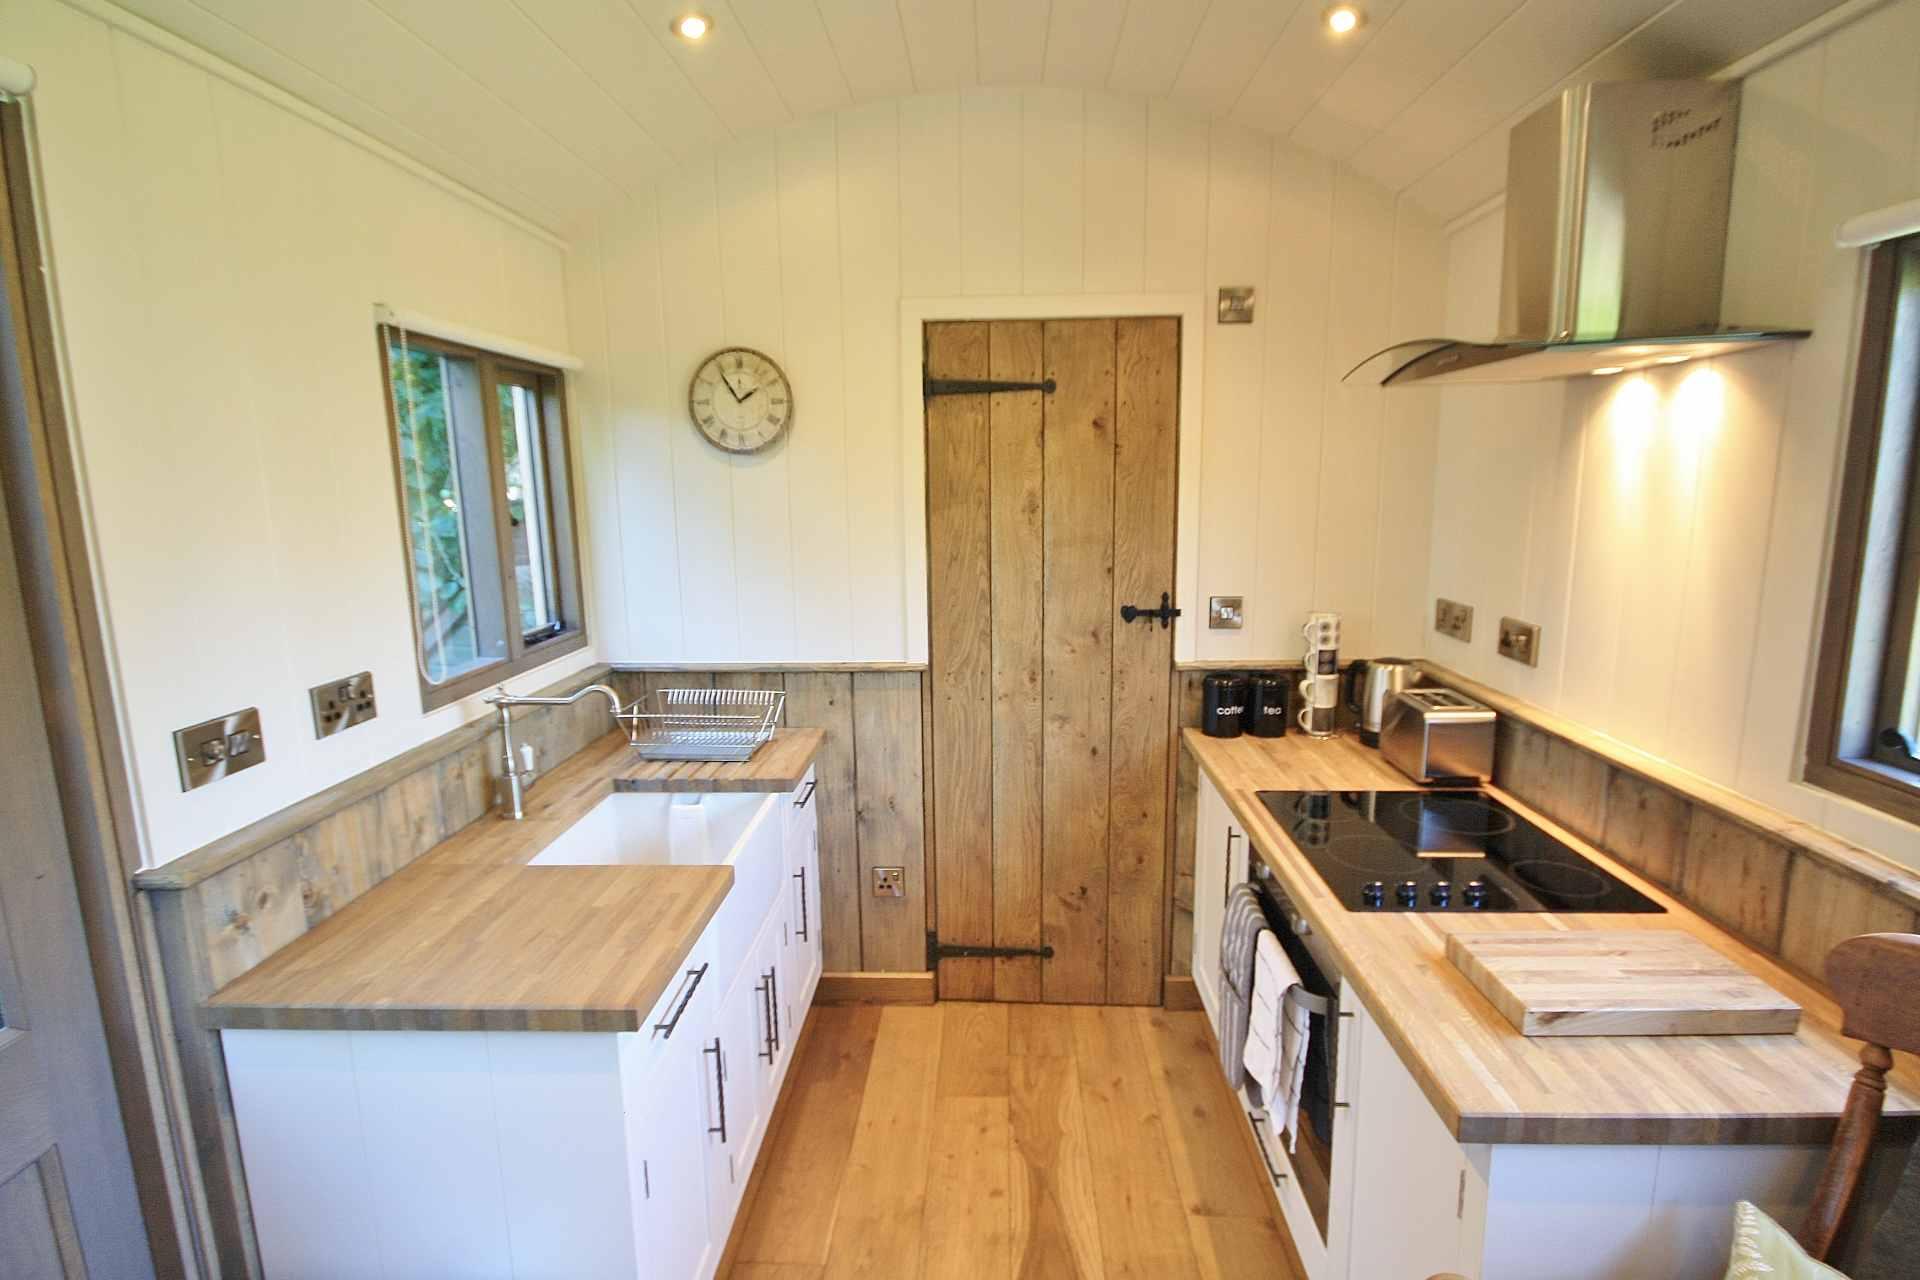 clean-modern-kitchen-inside-the-nest-shepherds-hut-in-buxton